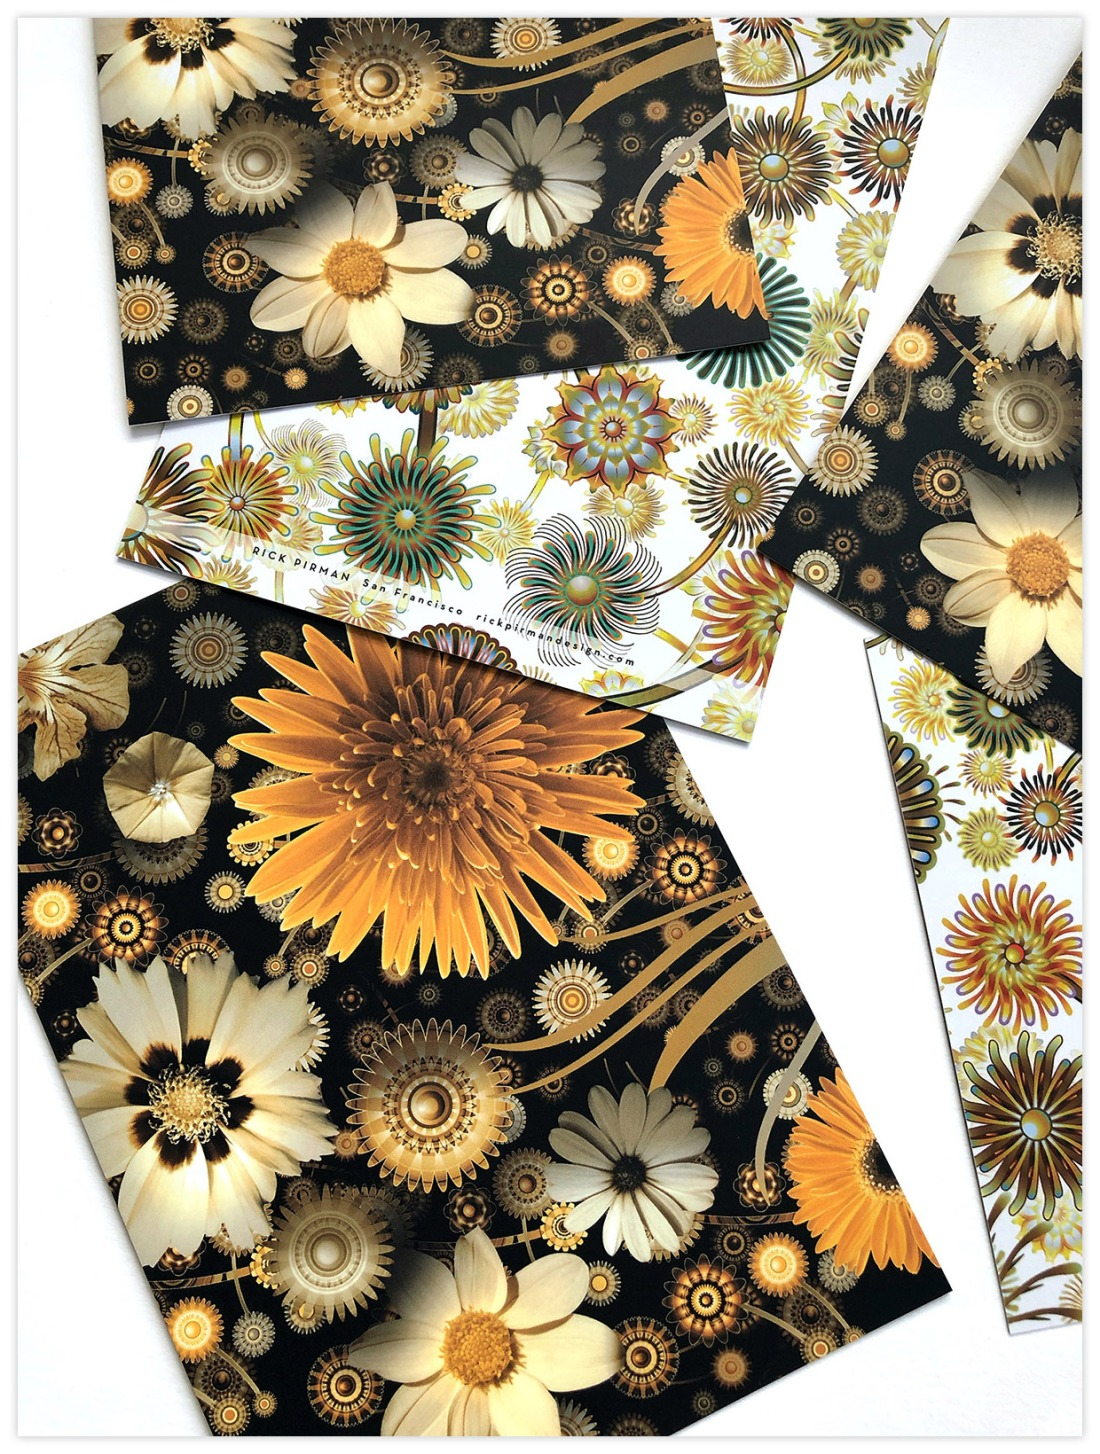 Summer flowers _1200